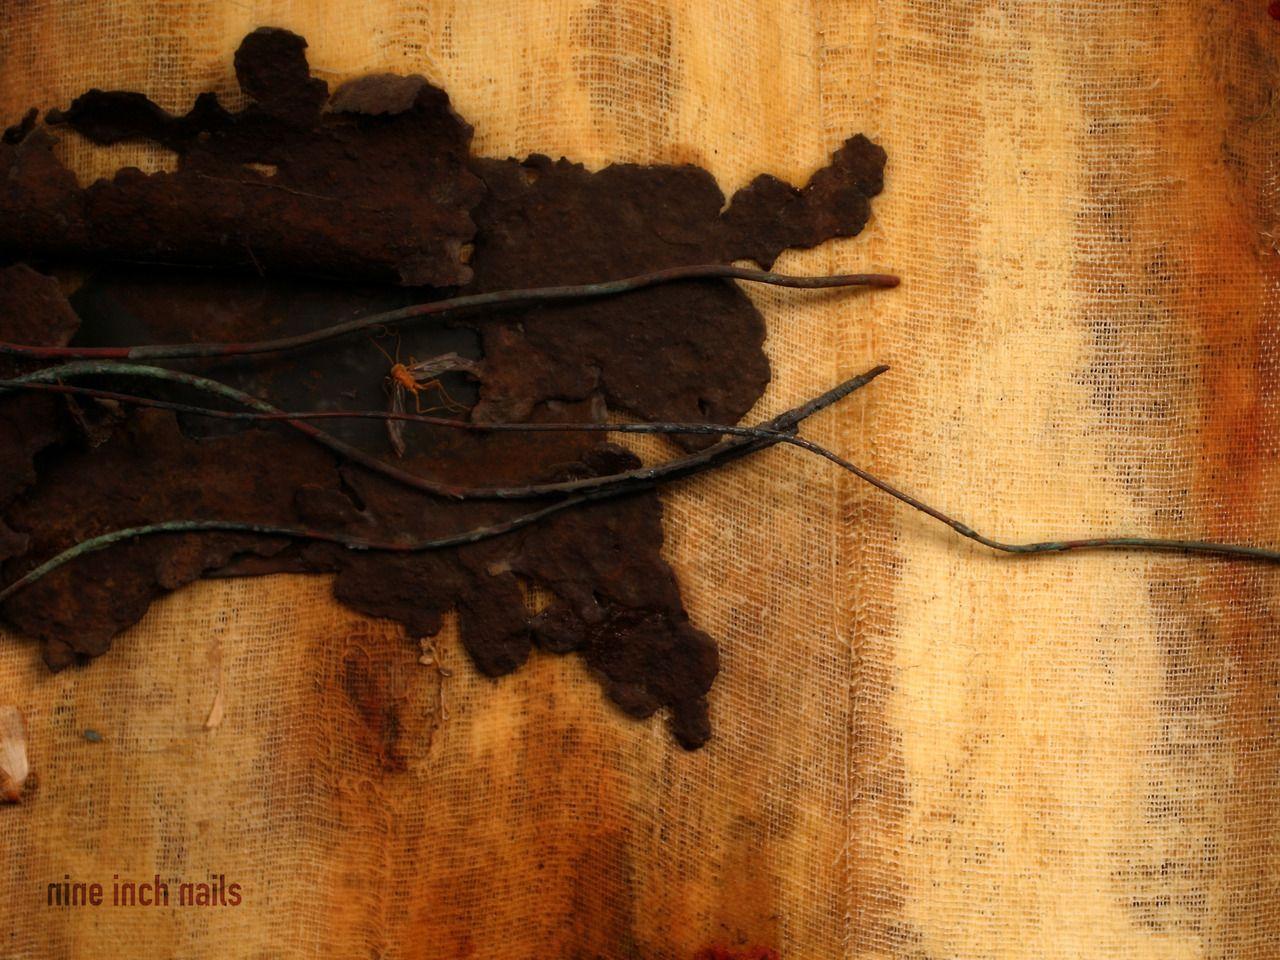 Hesitation Marks Wallpaper The Downward Spiral. A...